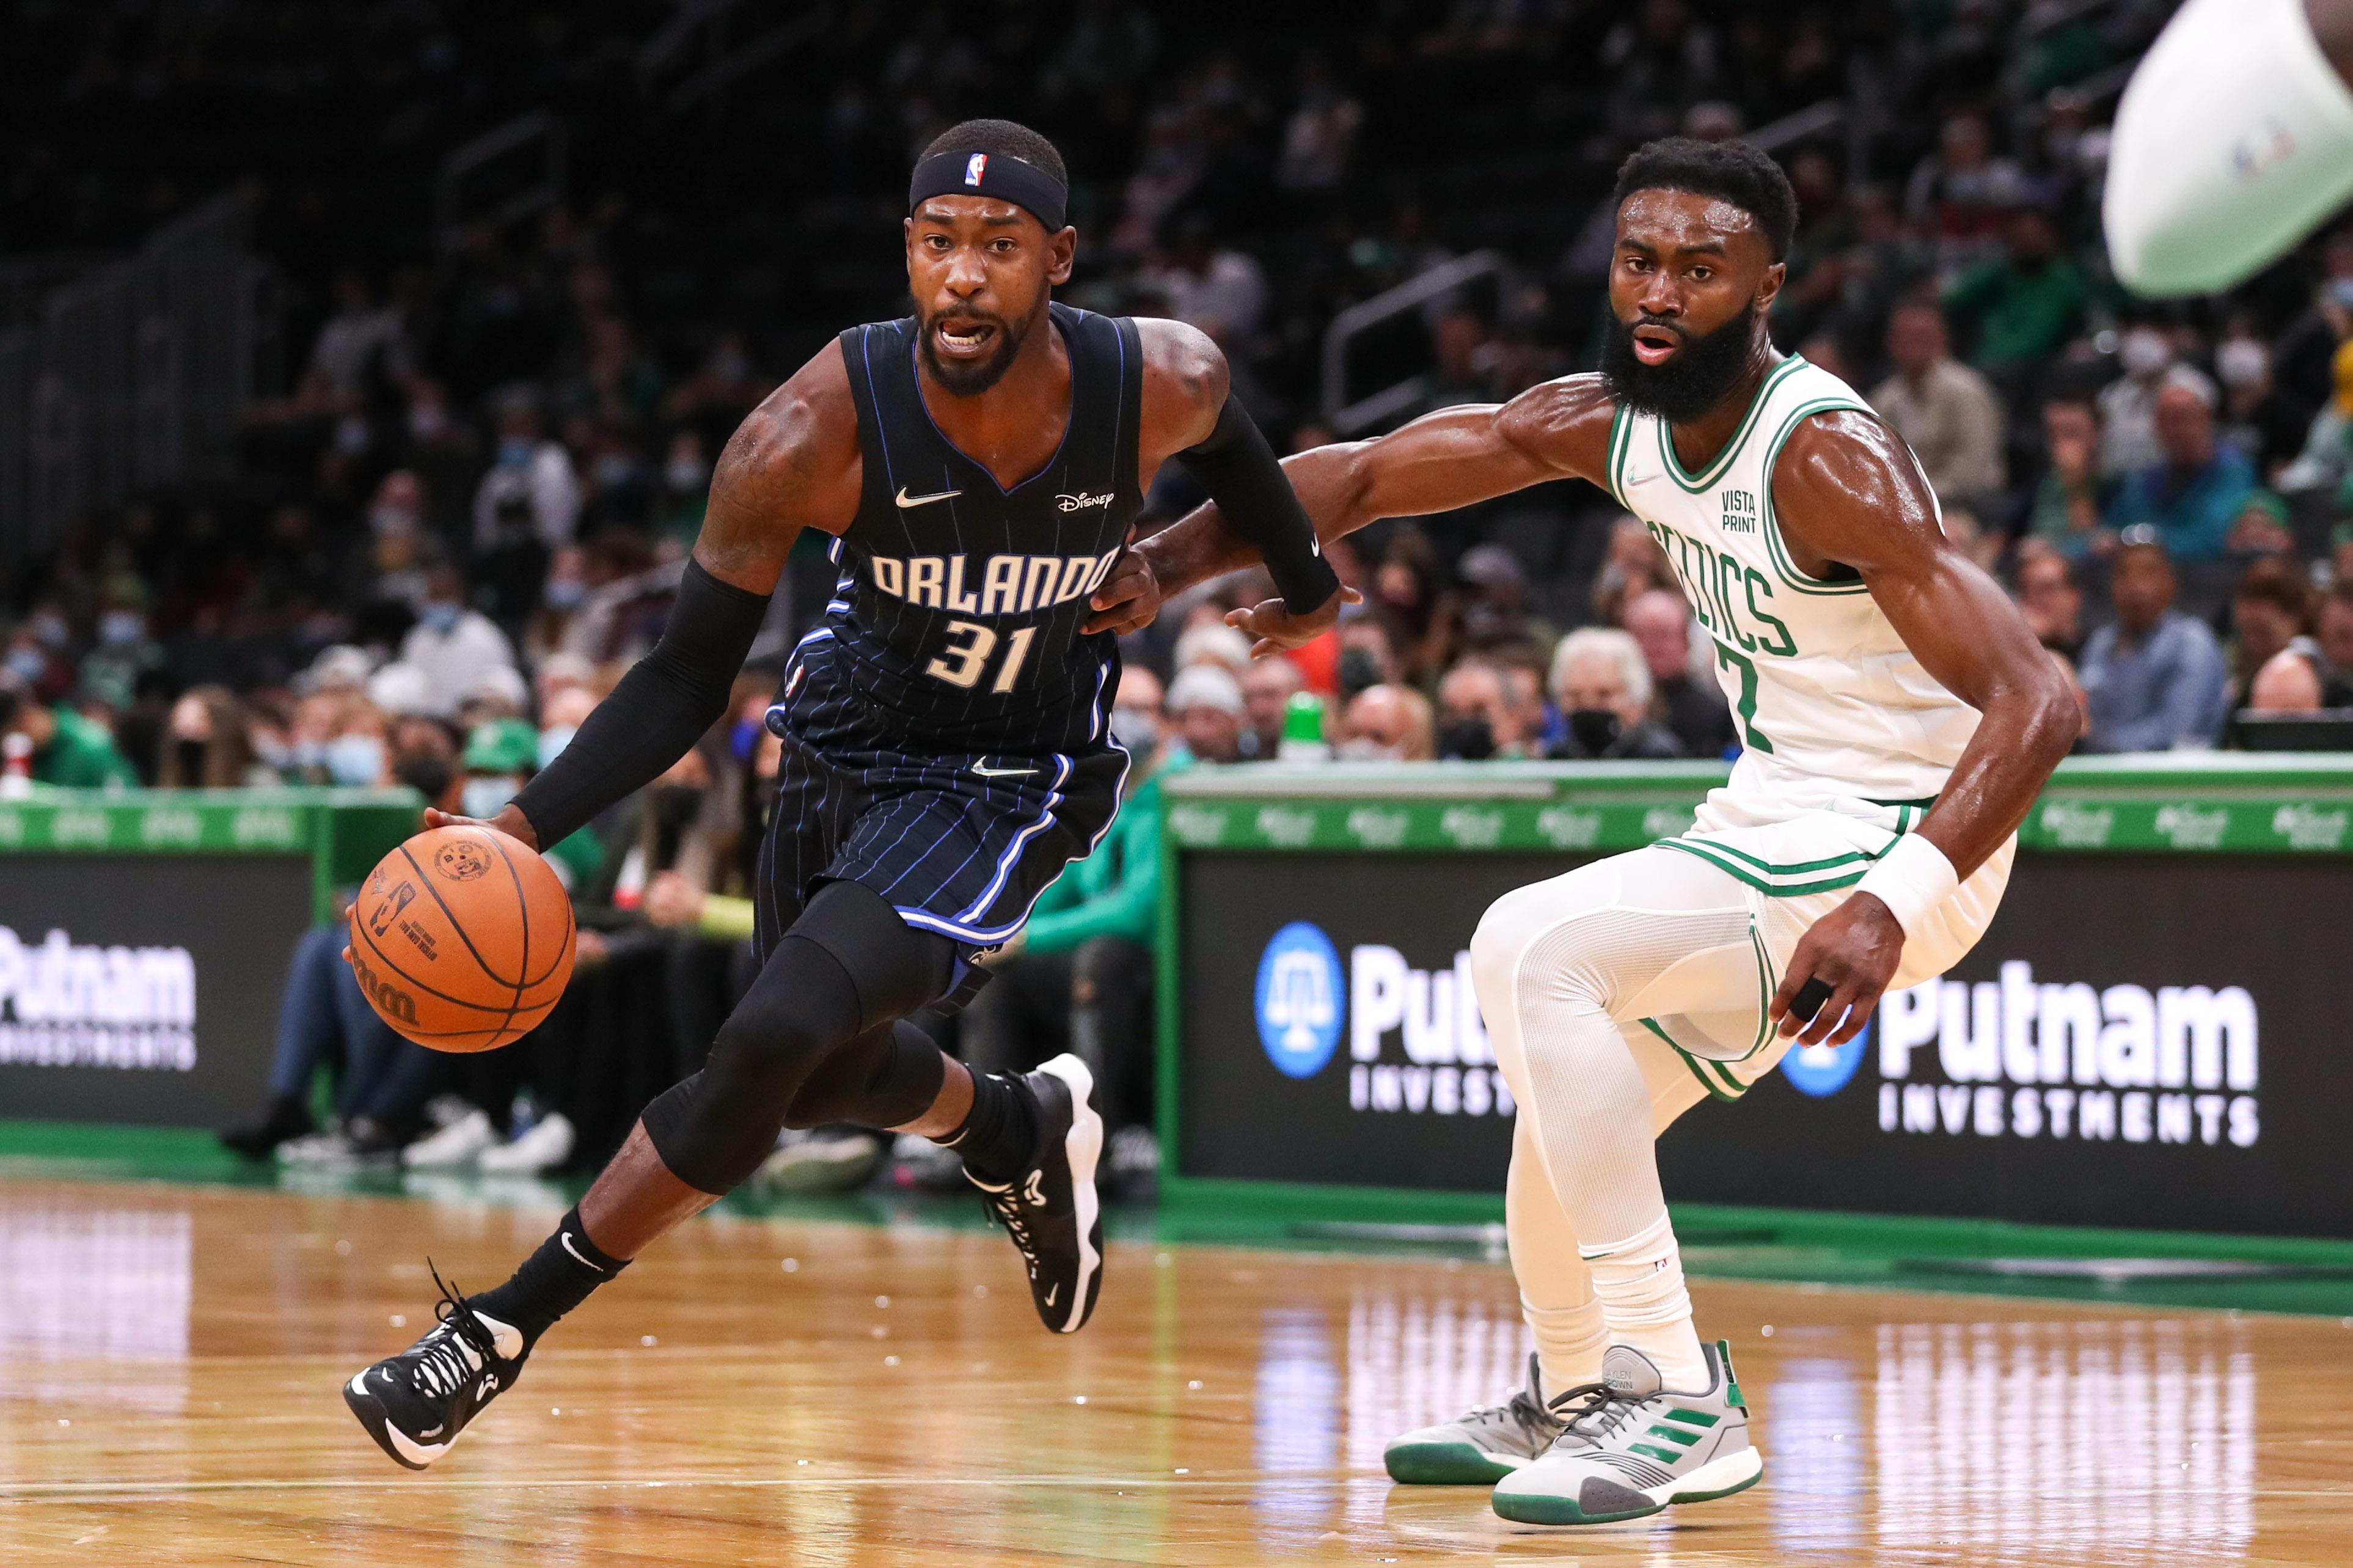 NBA: Preseason-Orlando Magic at Boston Celtics